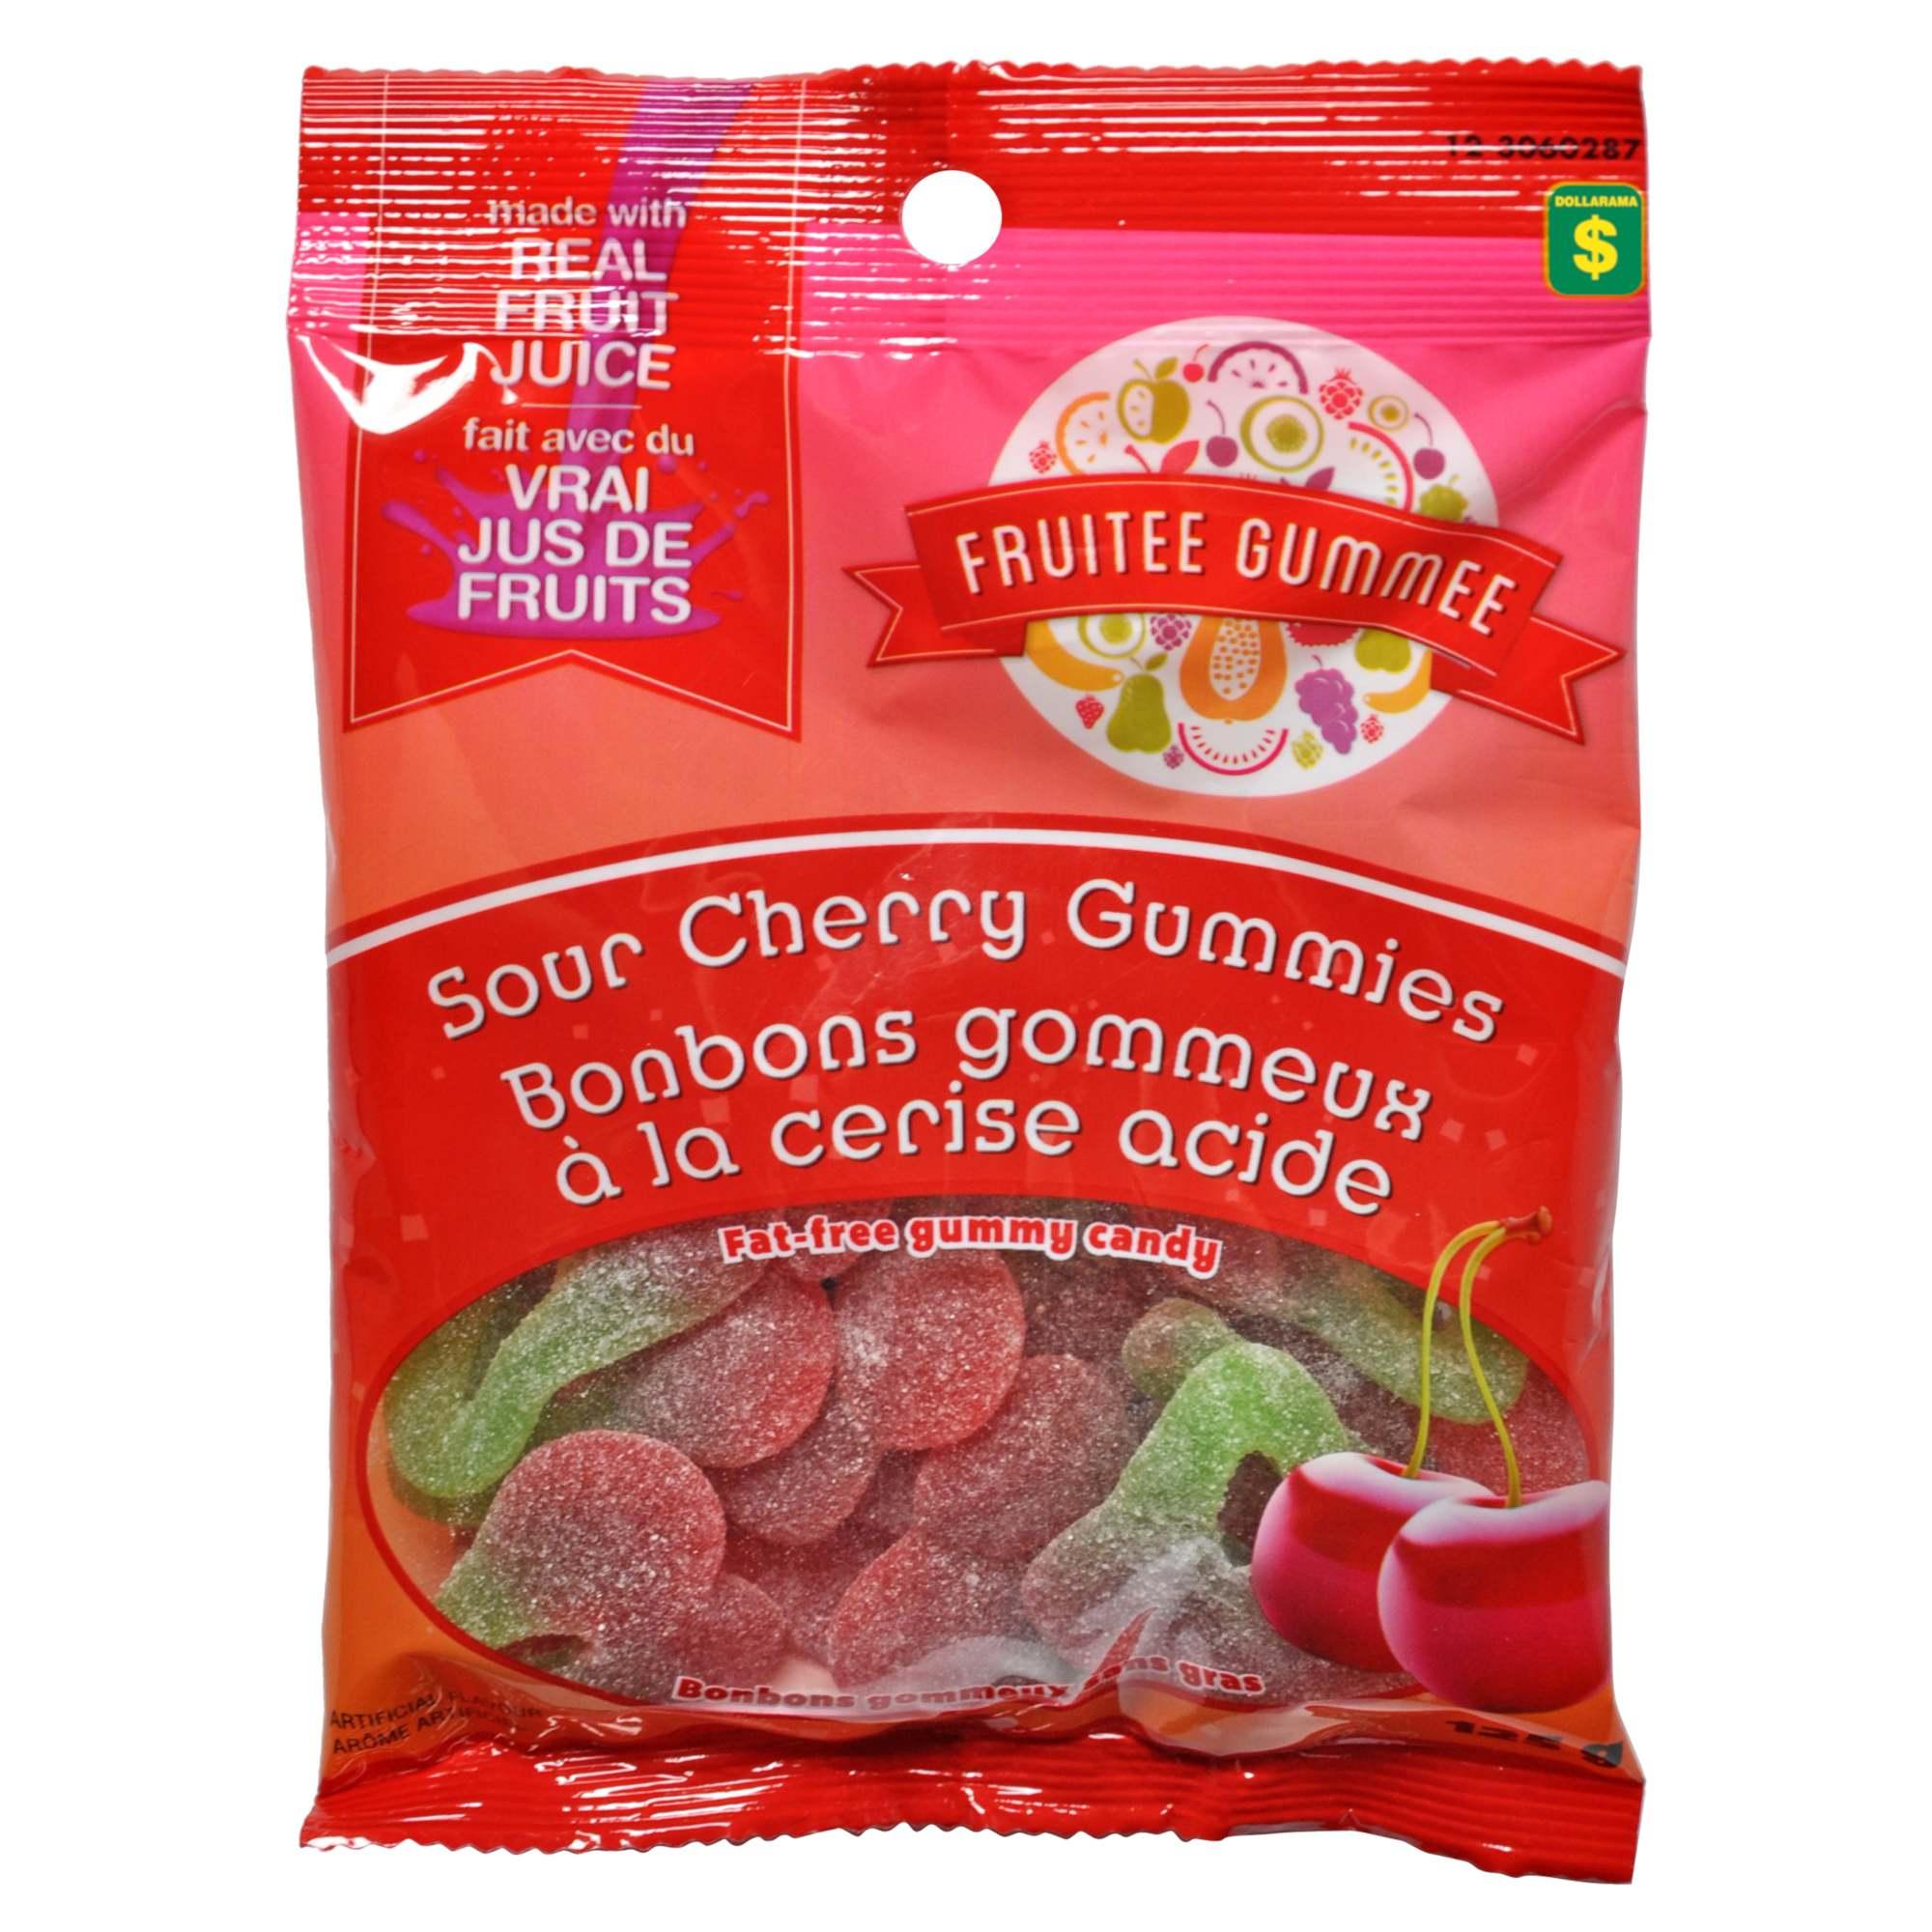 Sour Cherry Gummies Dollarama